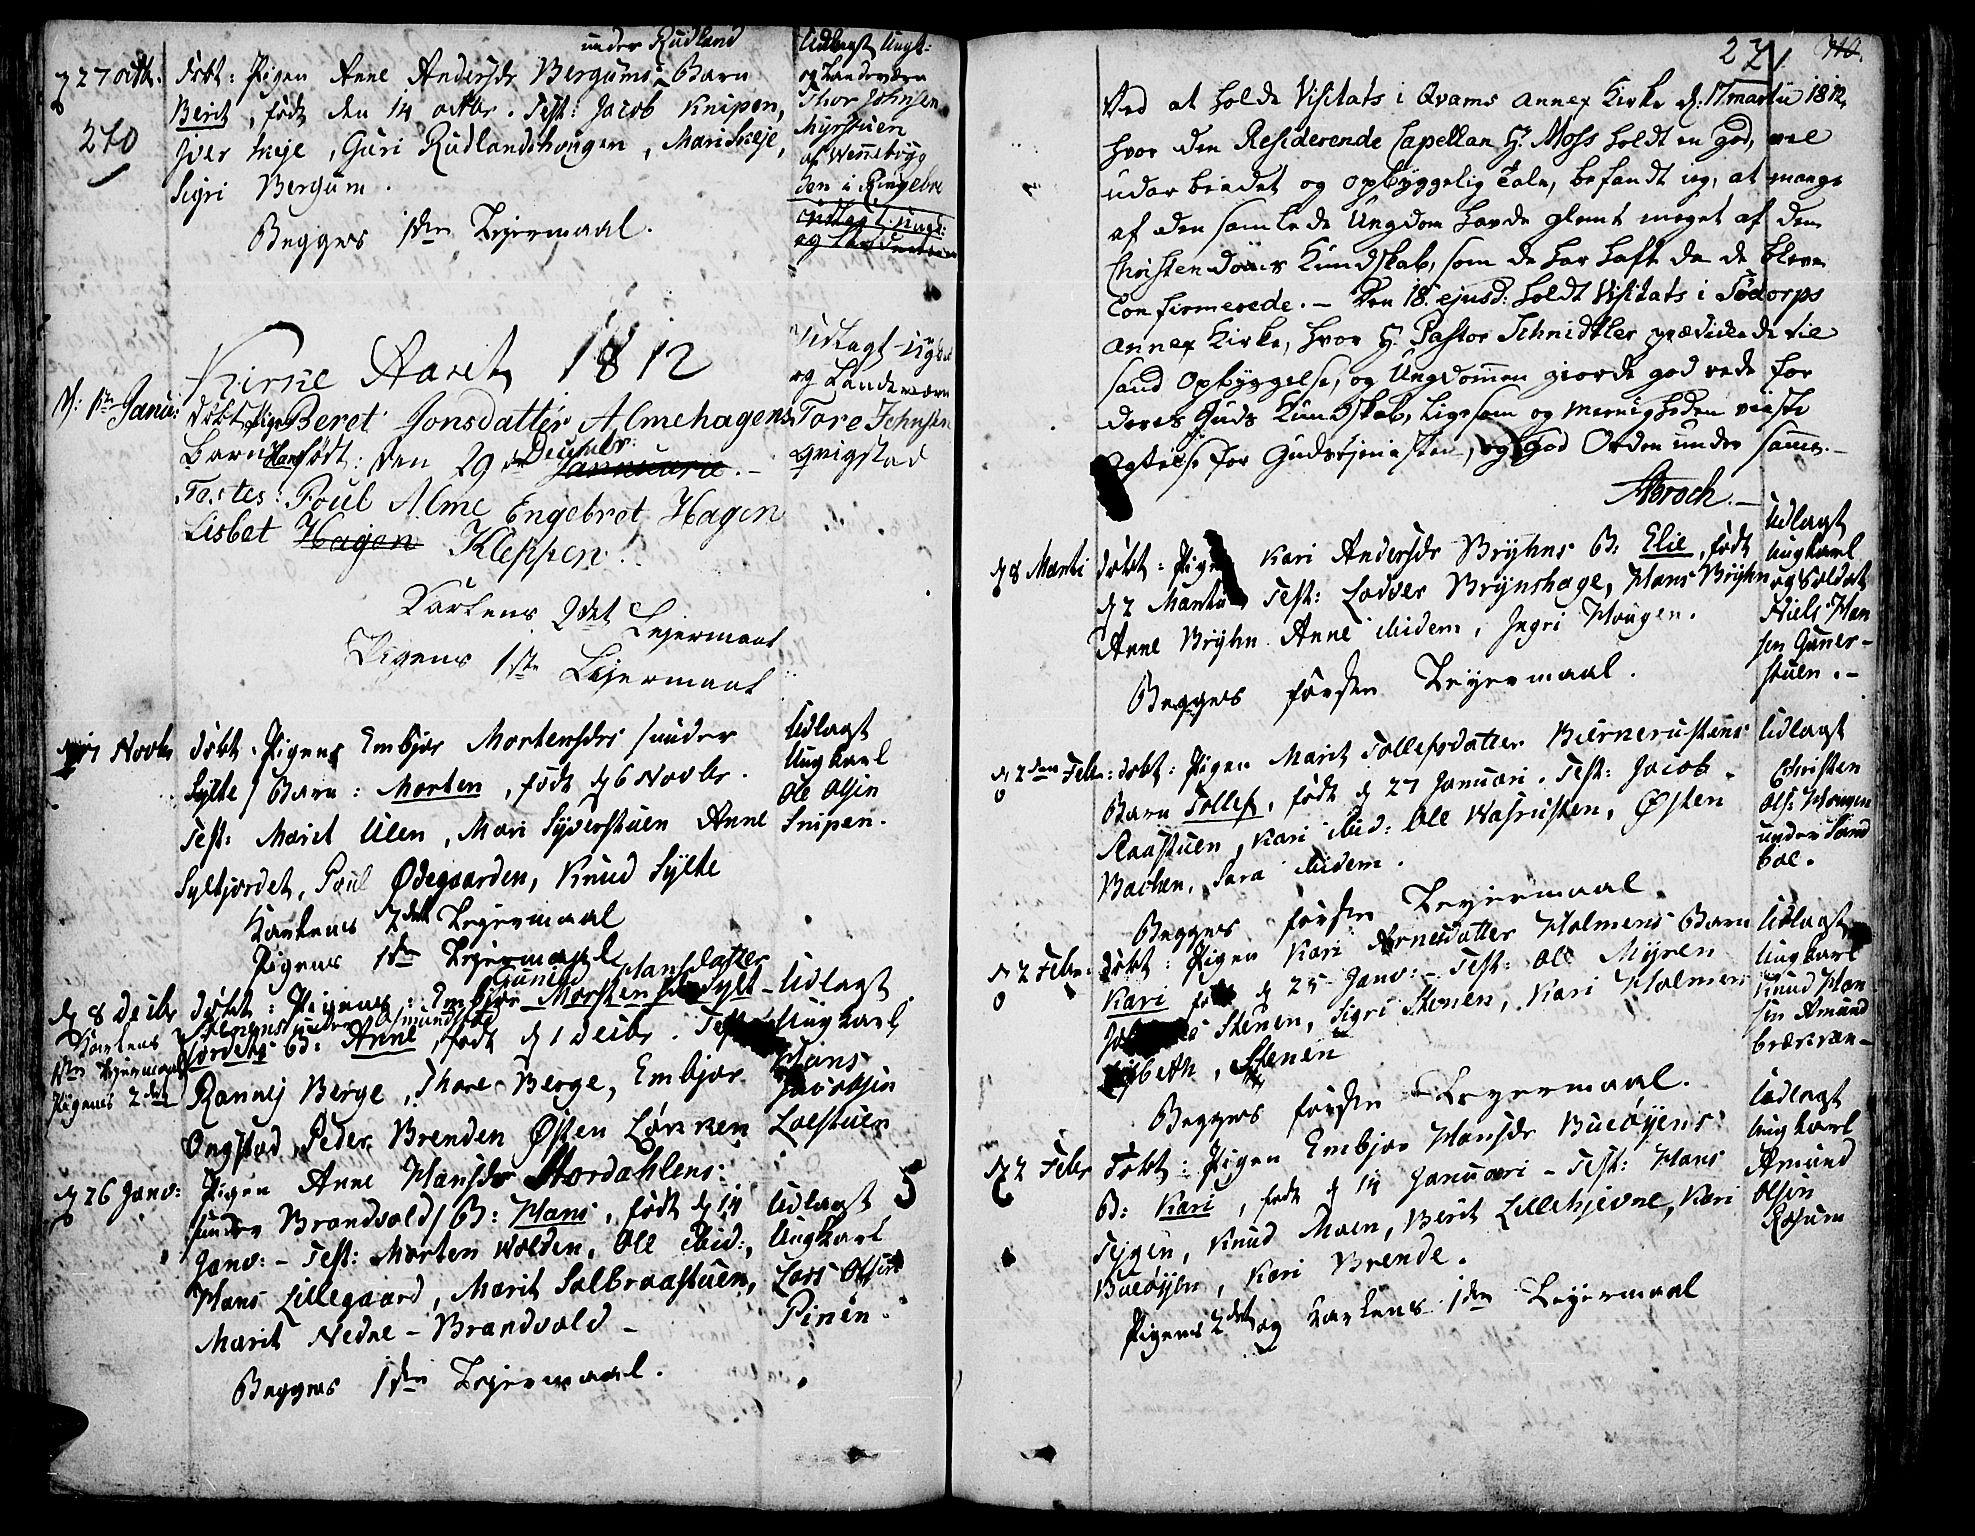 SAH, Fron prestekontor, H/Ha/Haa/L0001: Ministerialbok nr. 1, 1799-1816, s. 270-271